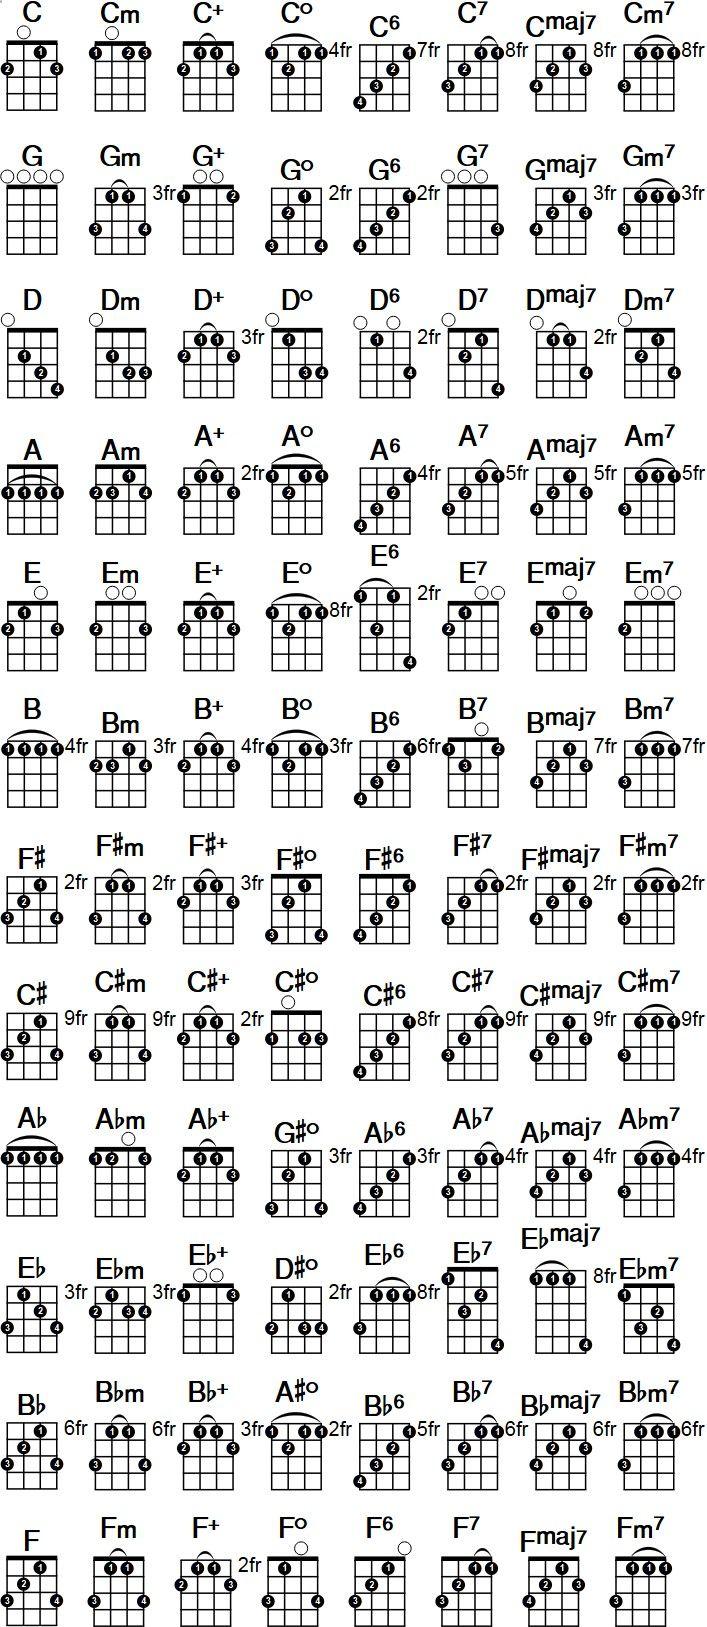 Printable Banjo Chord Chart Free Pdf Download At Banjochords